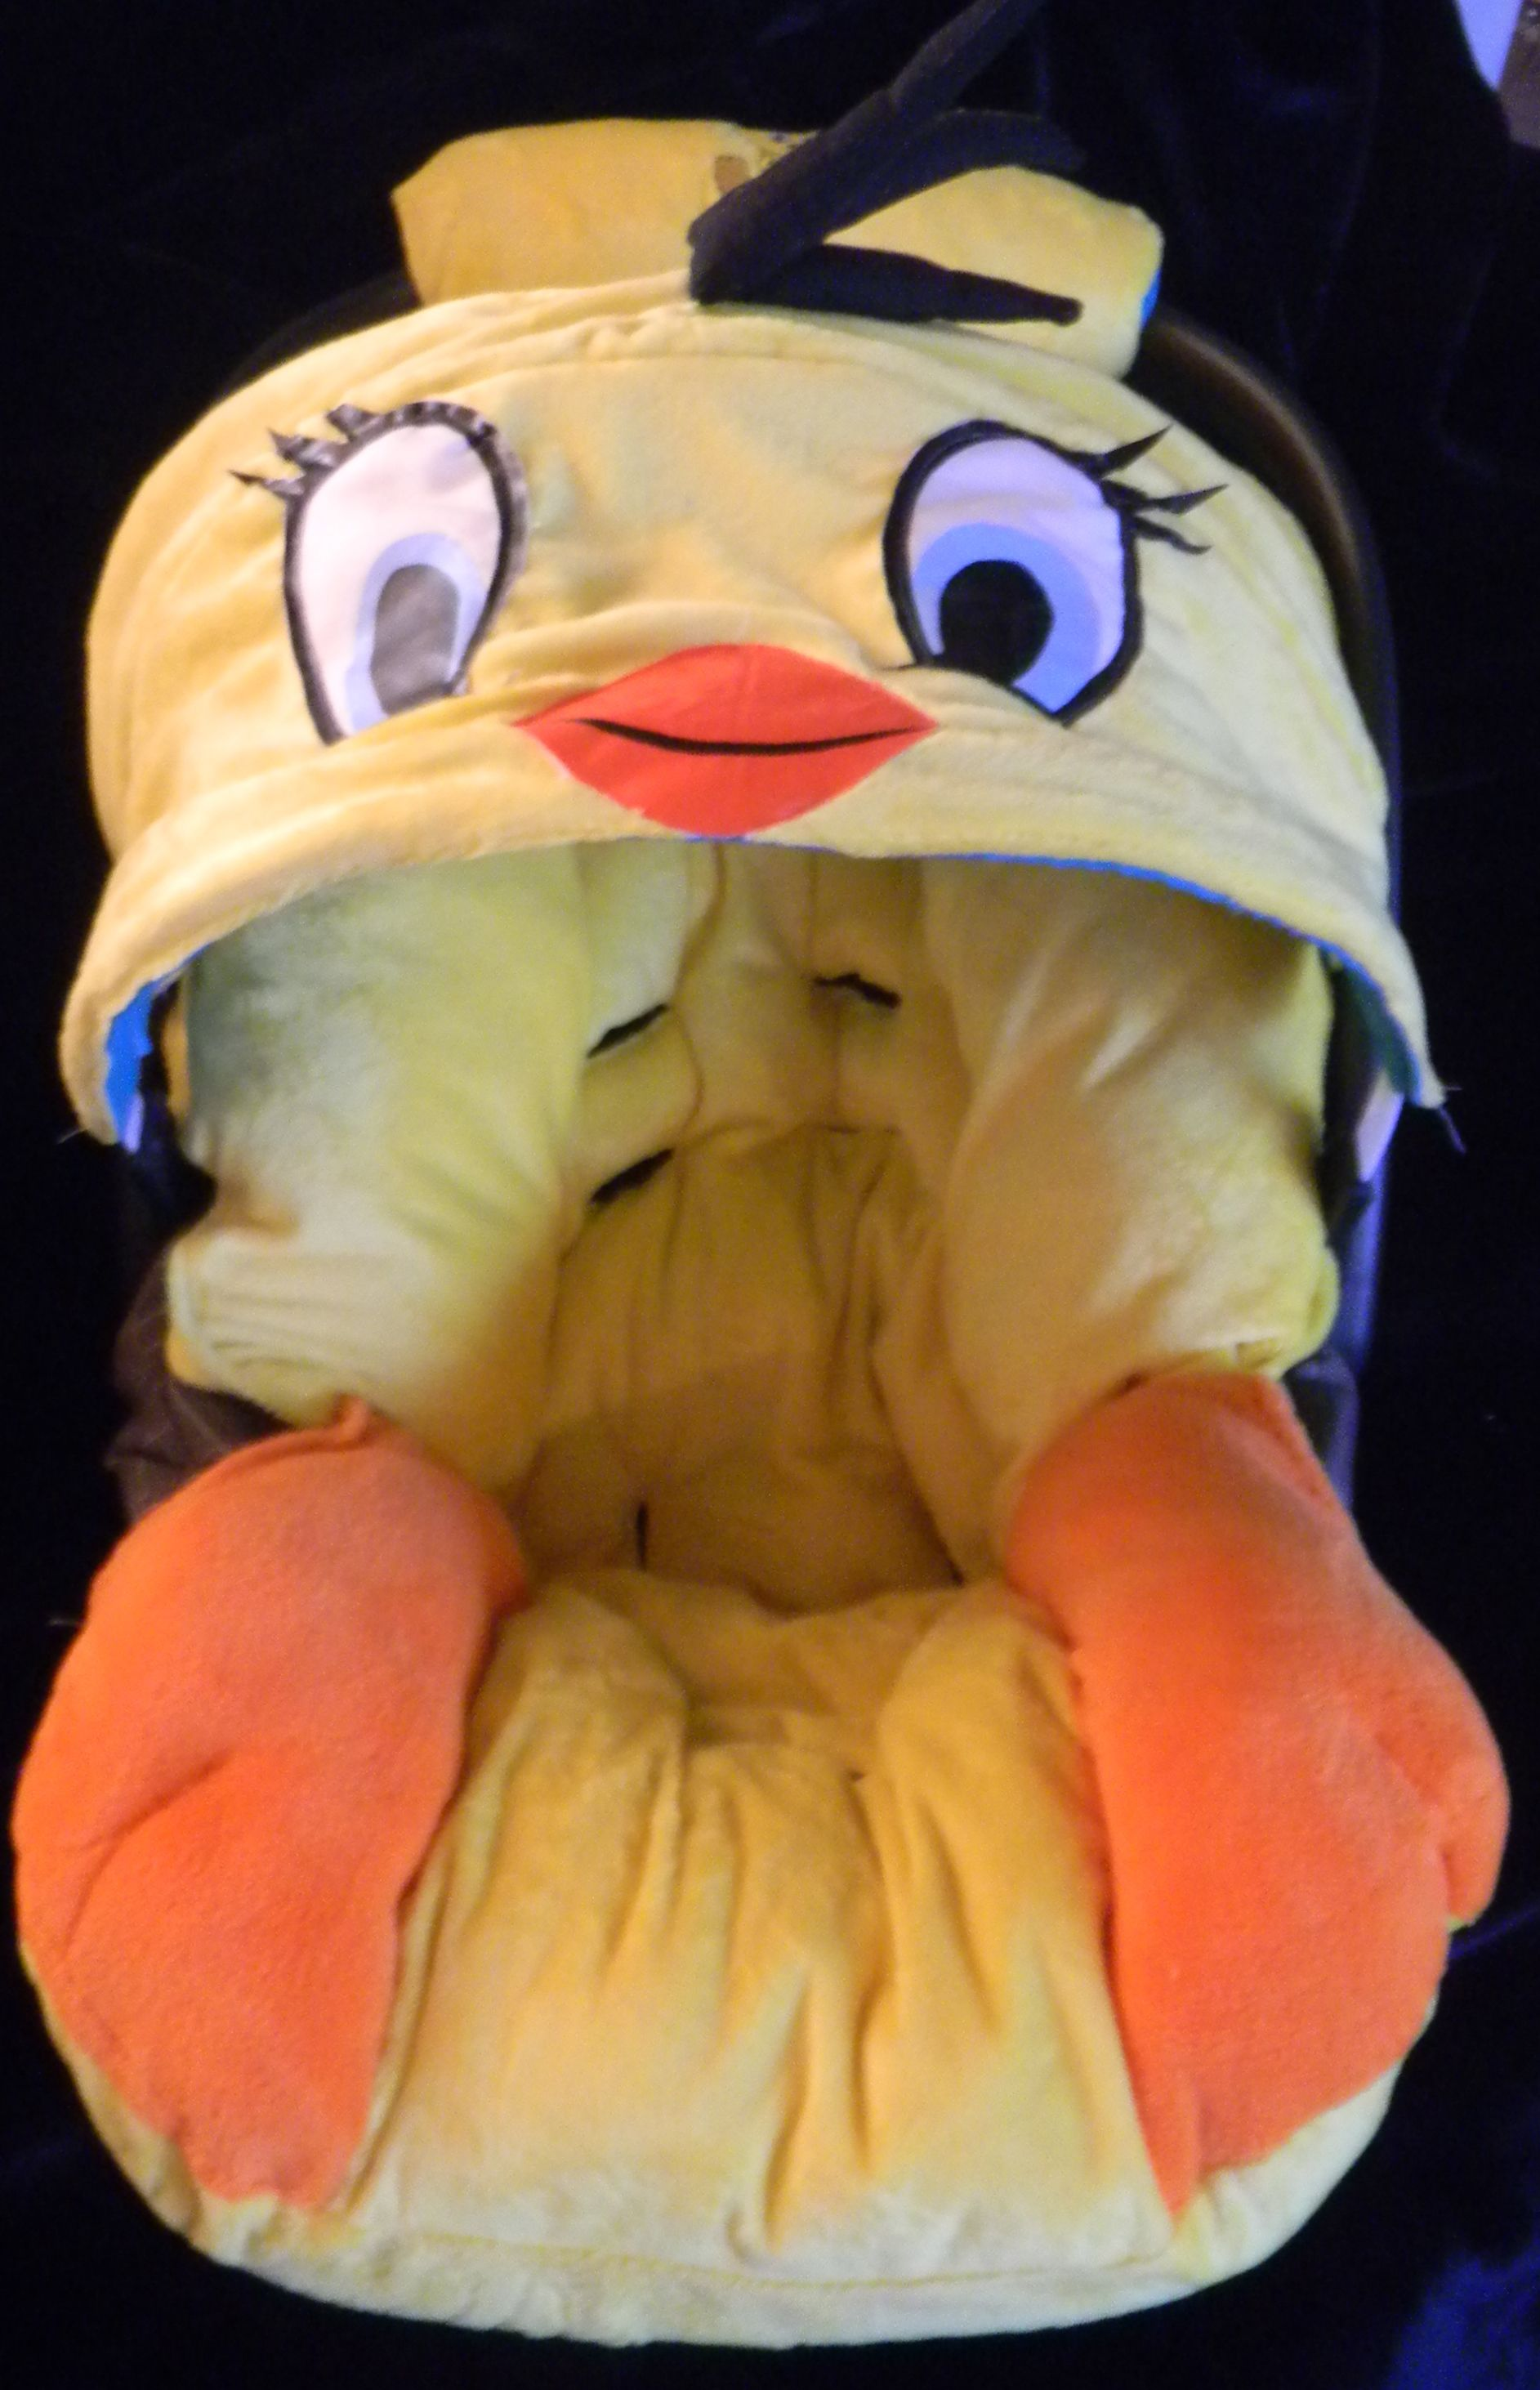 Tweety Bird Babies Rooms Seat Covers Car Hdr Glove